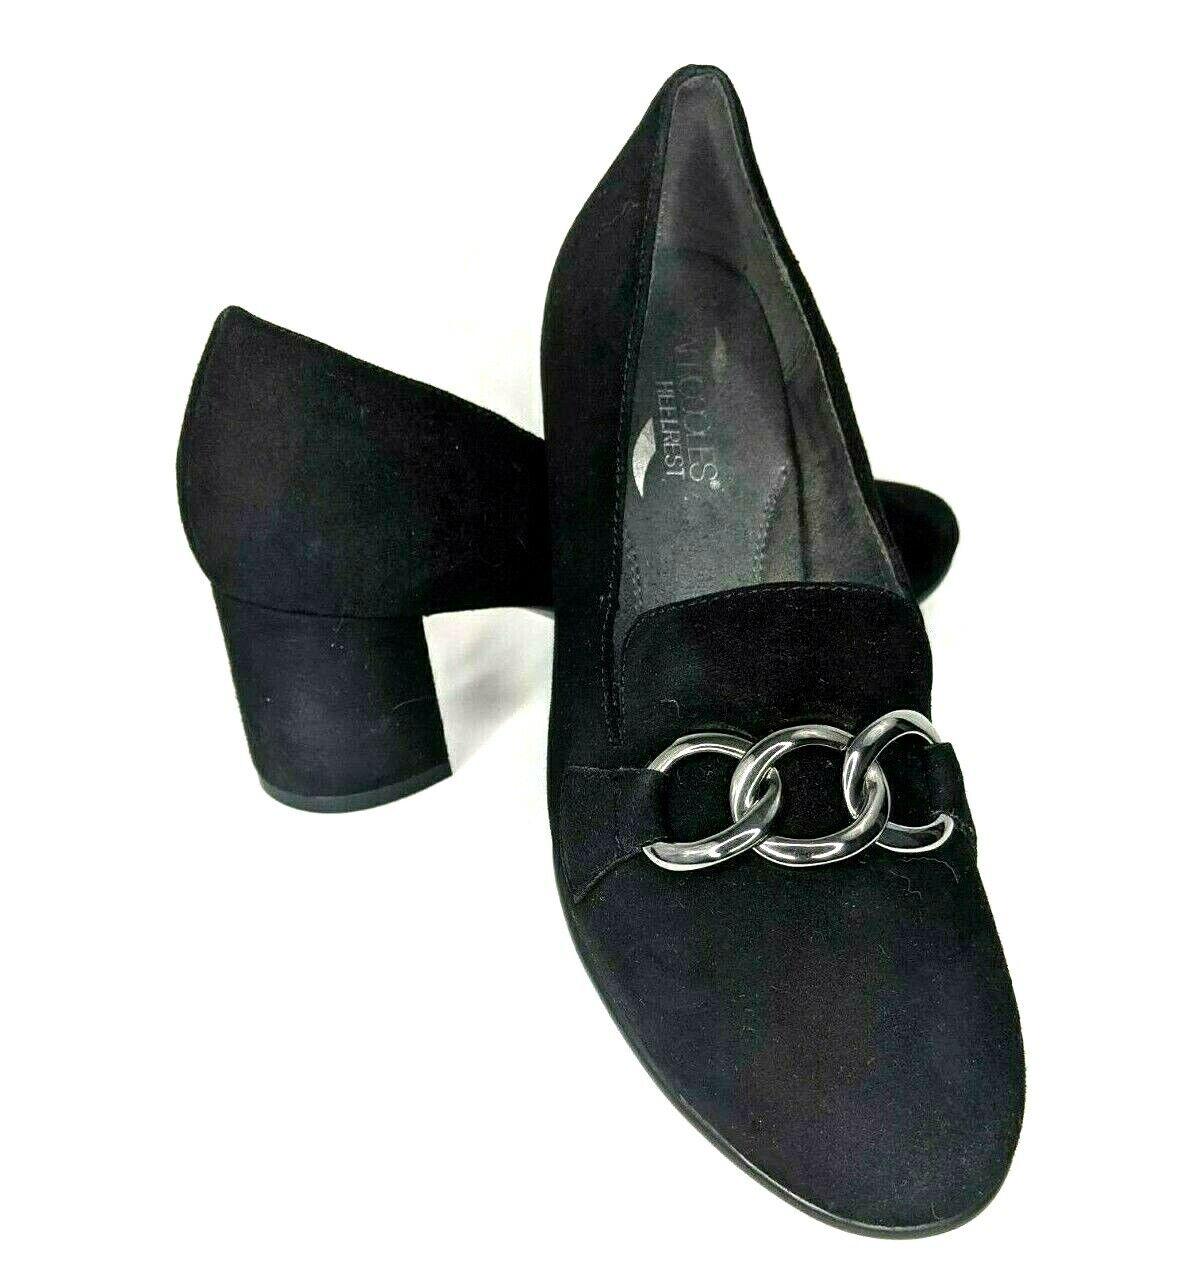 Aerosoles Women's Pump Heel Size 8.5 M Black Stretch Round Toe Leather Suede